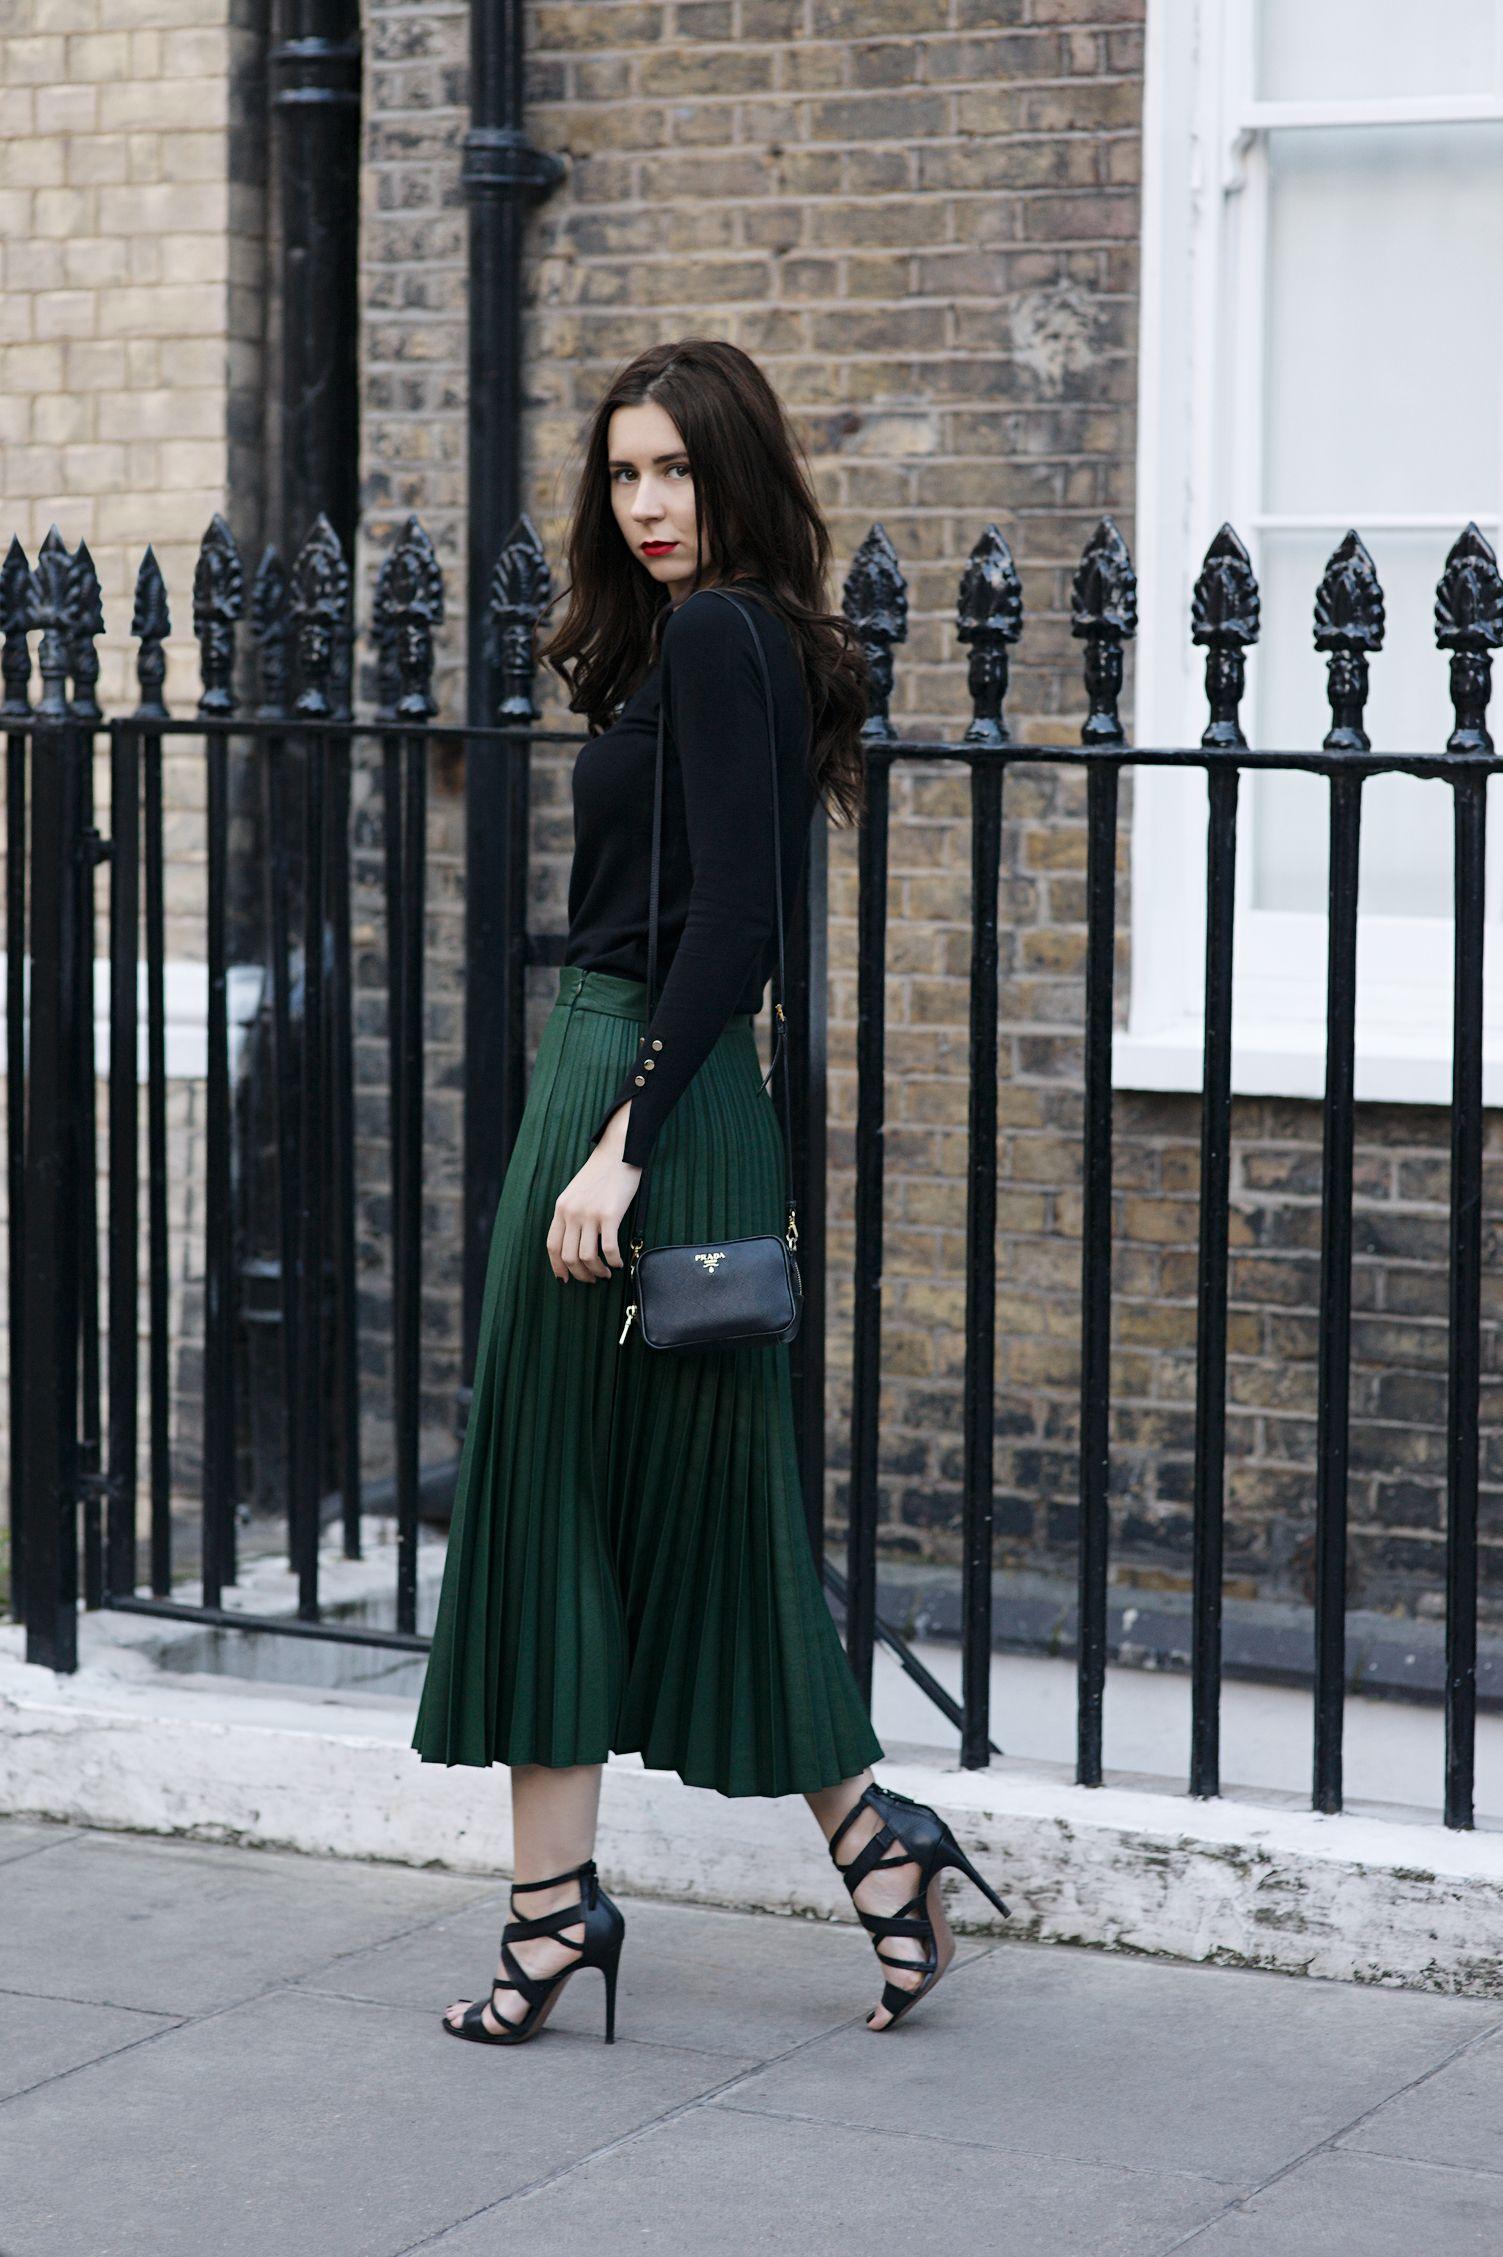 c160c179fd the 3 7 14 fashion rule zara green pleated skirt black sandals black jumper  prada bag outfit london fashion blogger diana cloudlet london fashion week